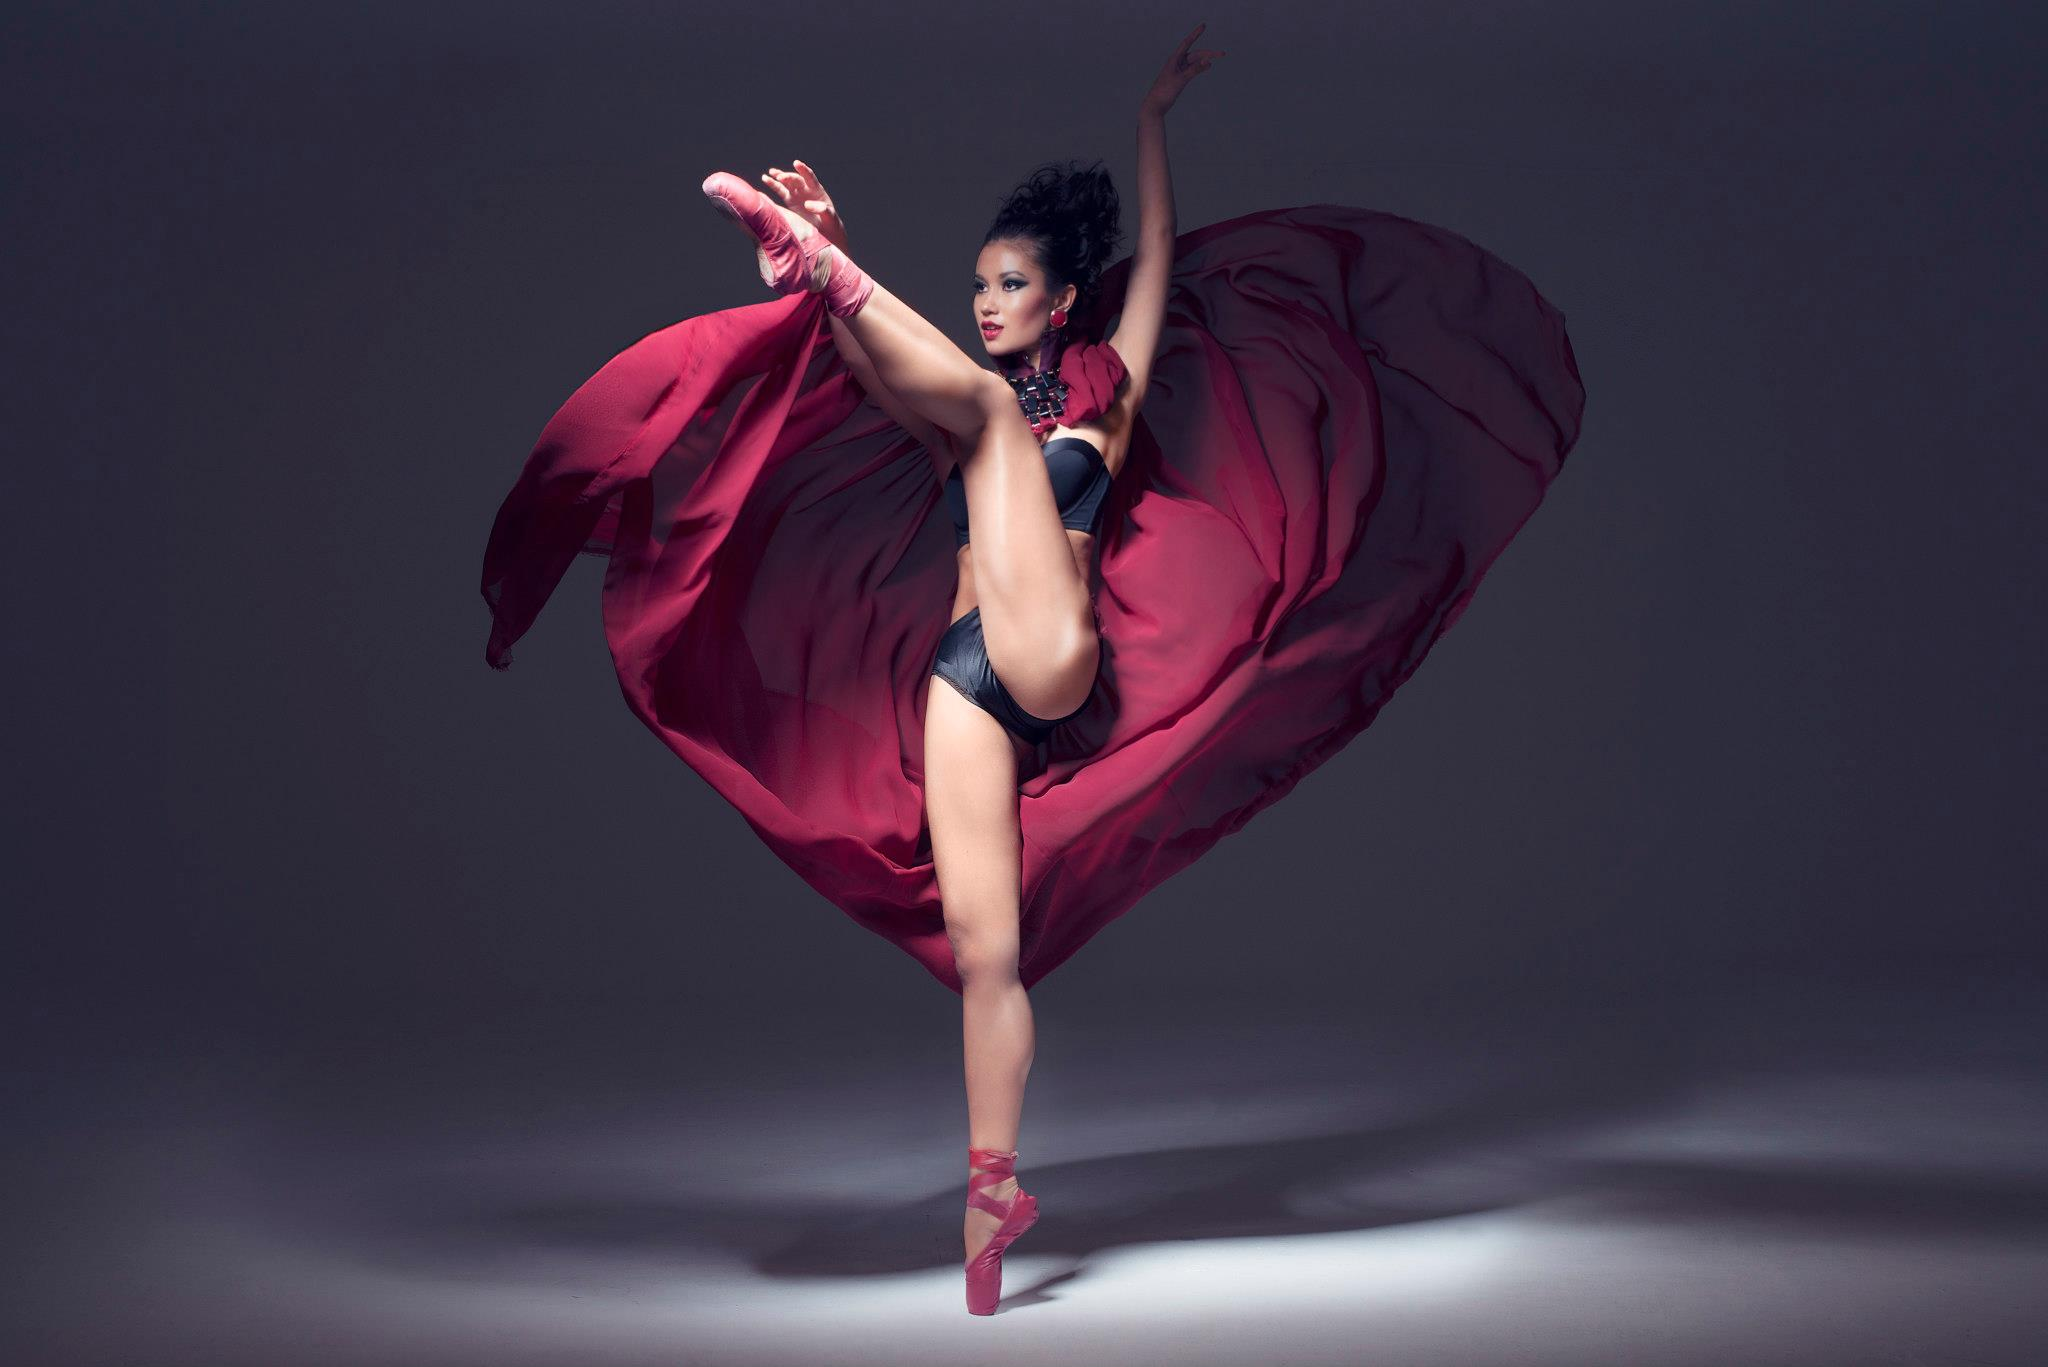 Anna Magrath dance.jpg